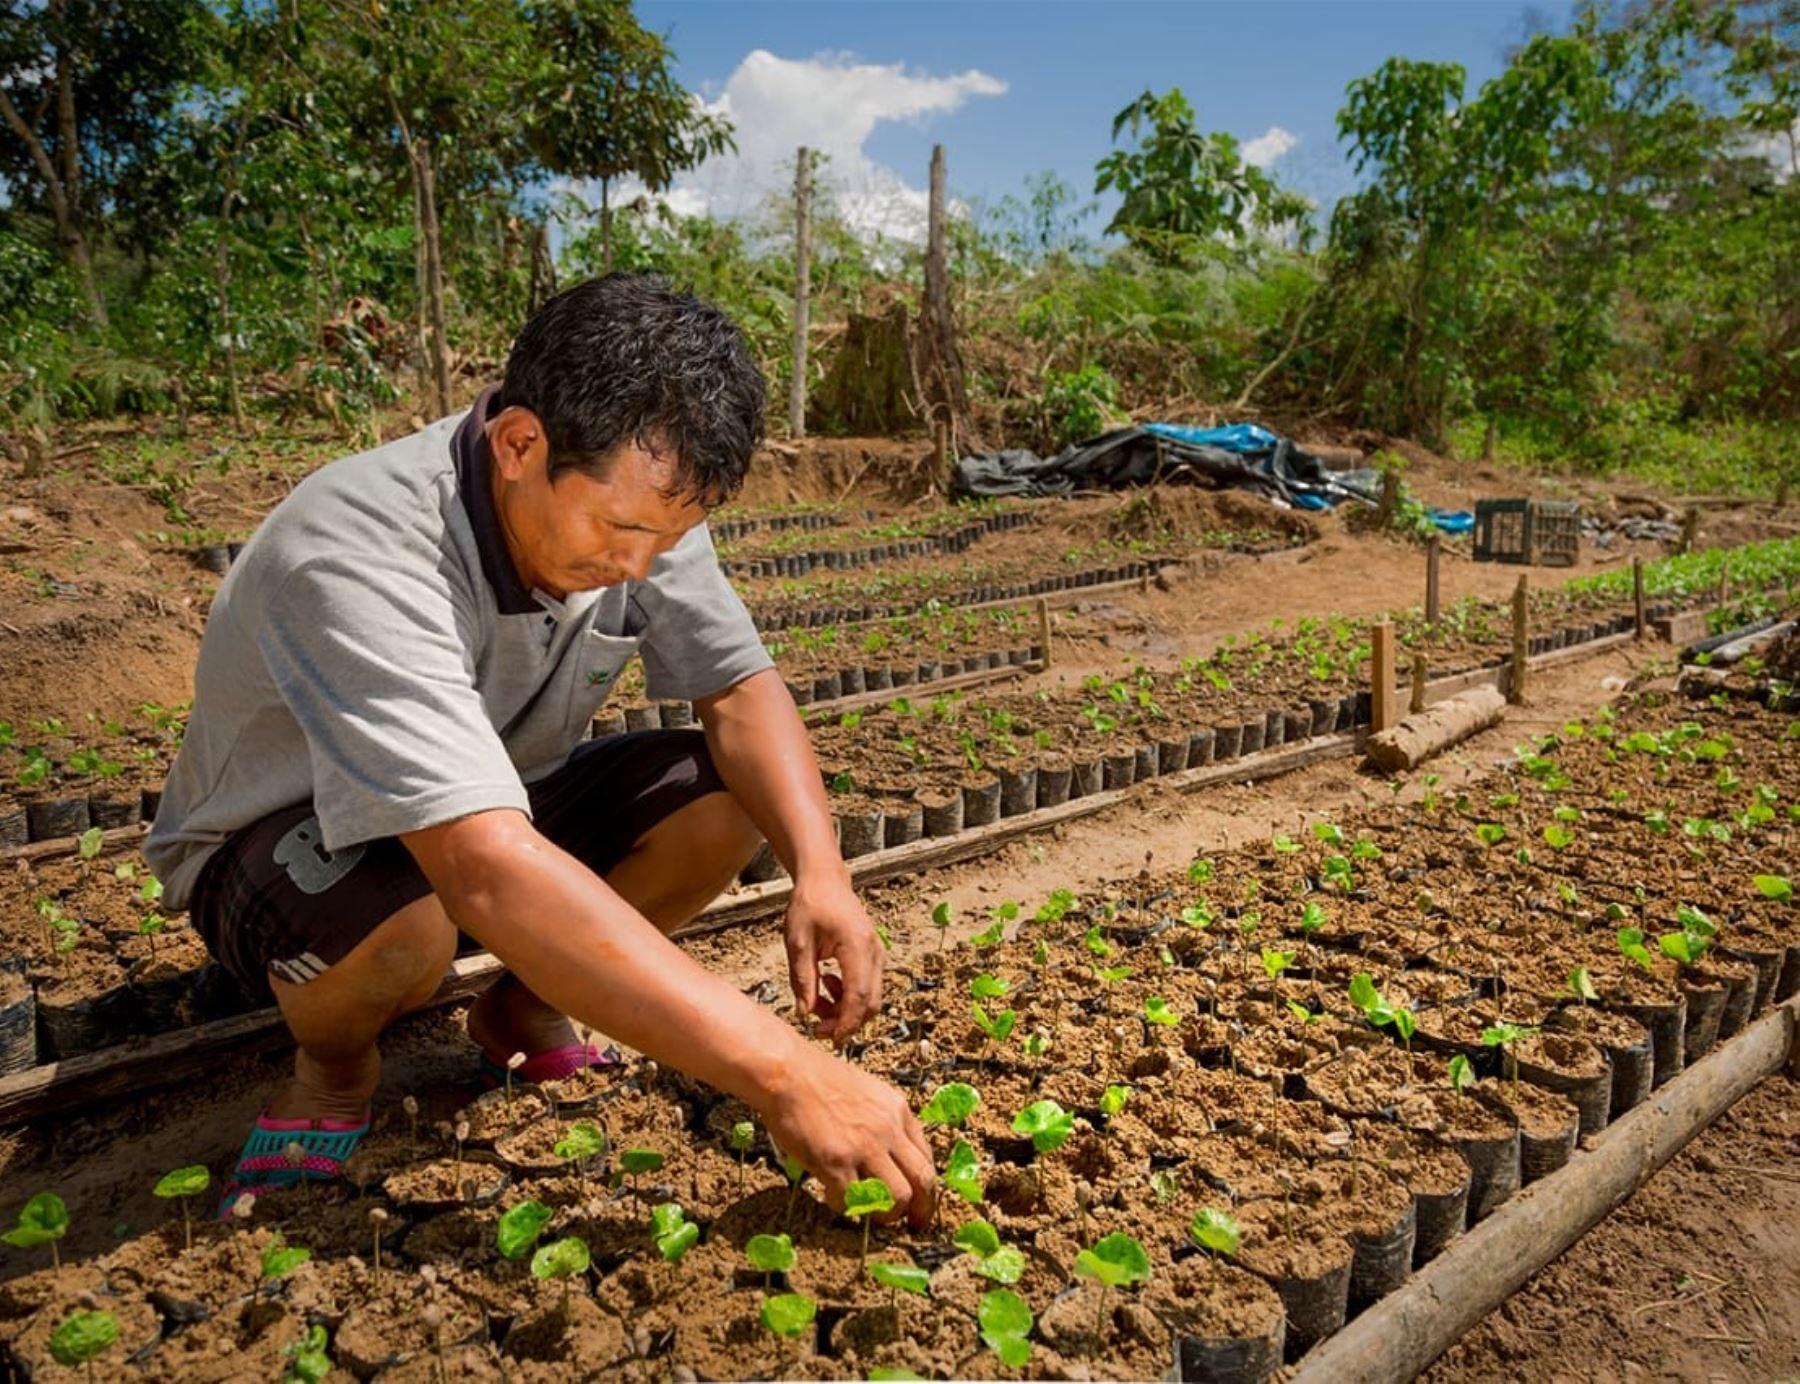 vraem-productores-de-cafe-renovaran-certificacion-organica-para-acceder-a-mercado-mundial